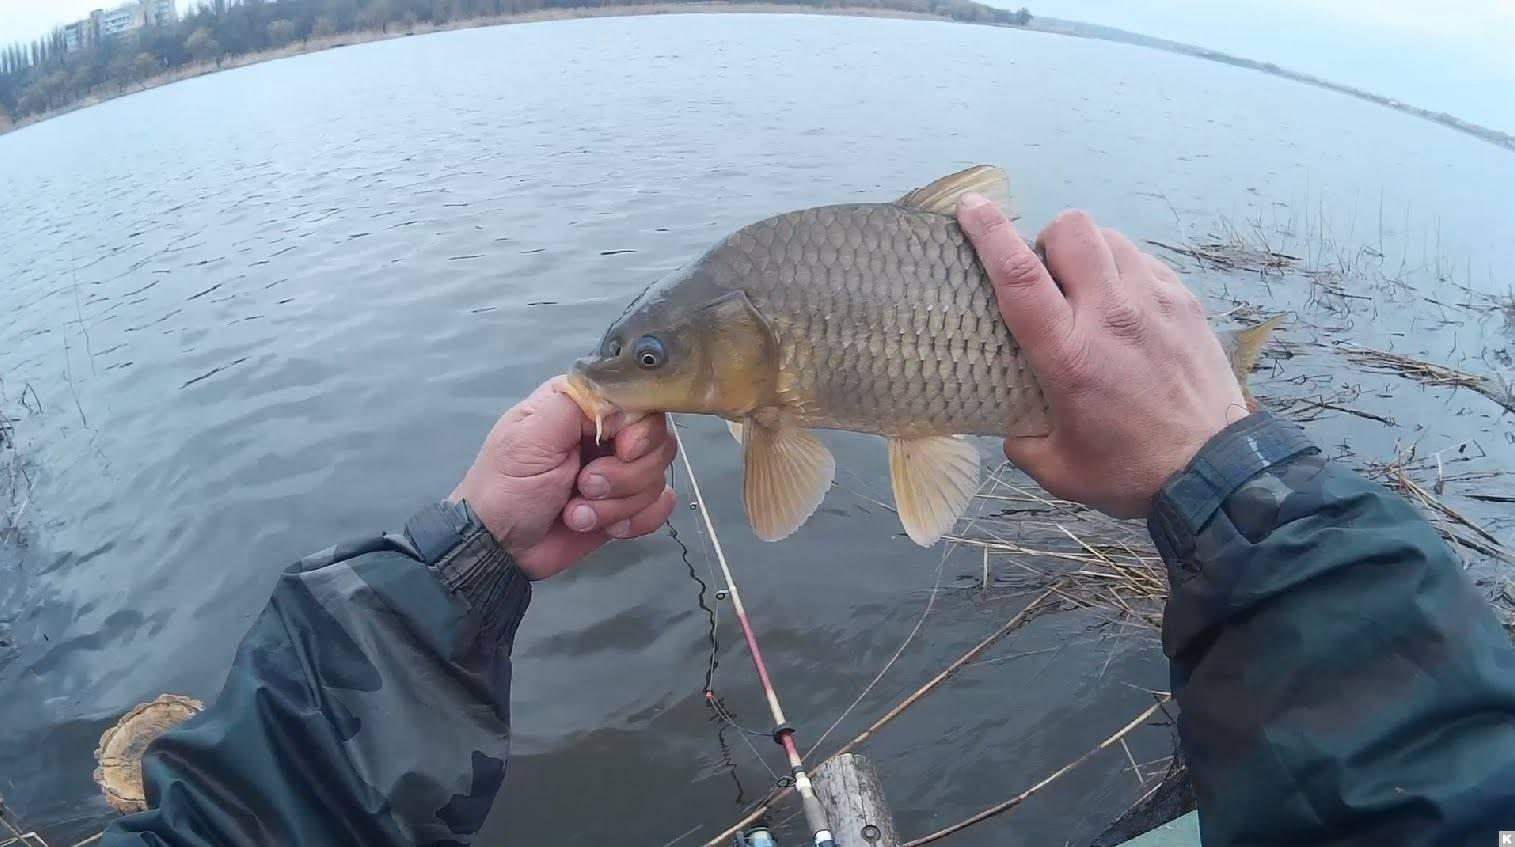 Рыбалка на карпа весной: снасть, наживка и техника